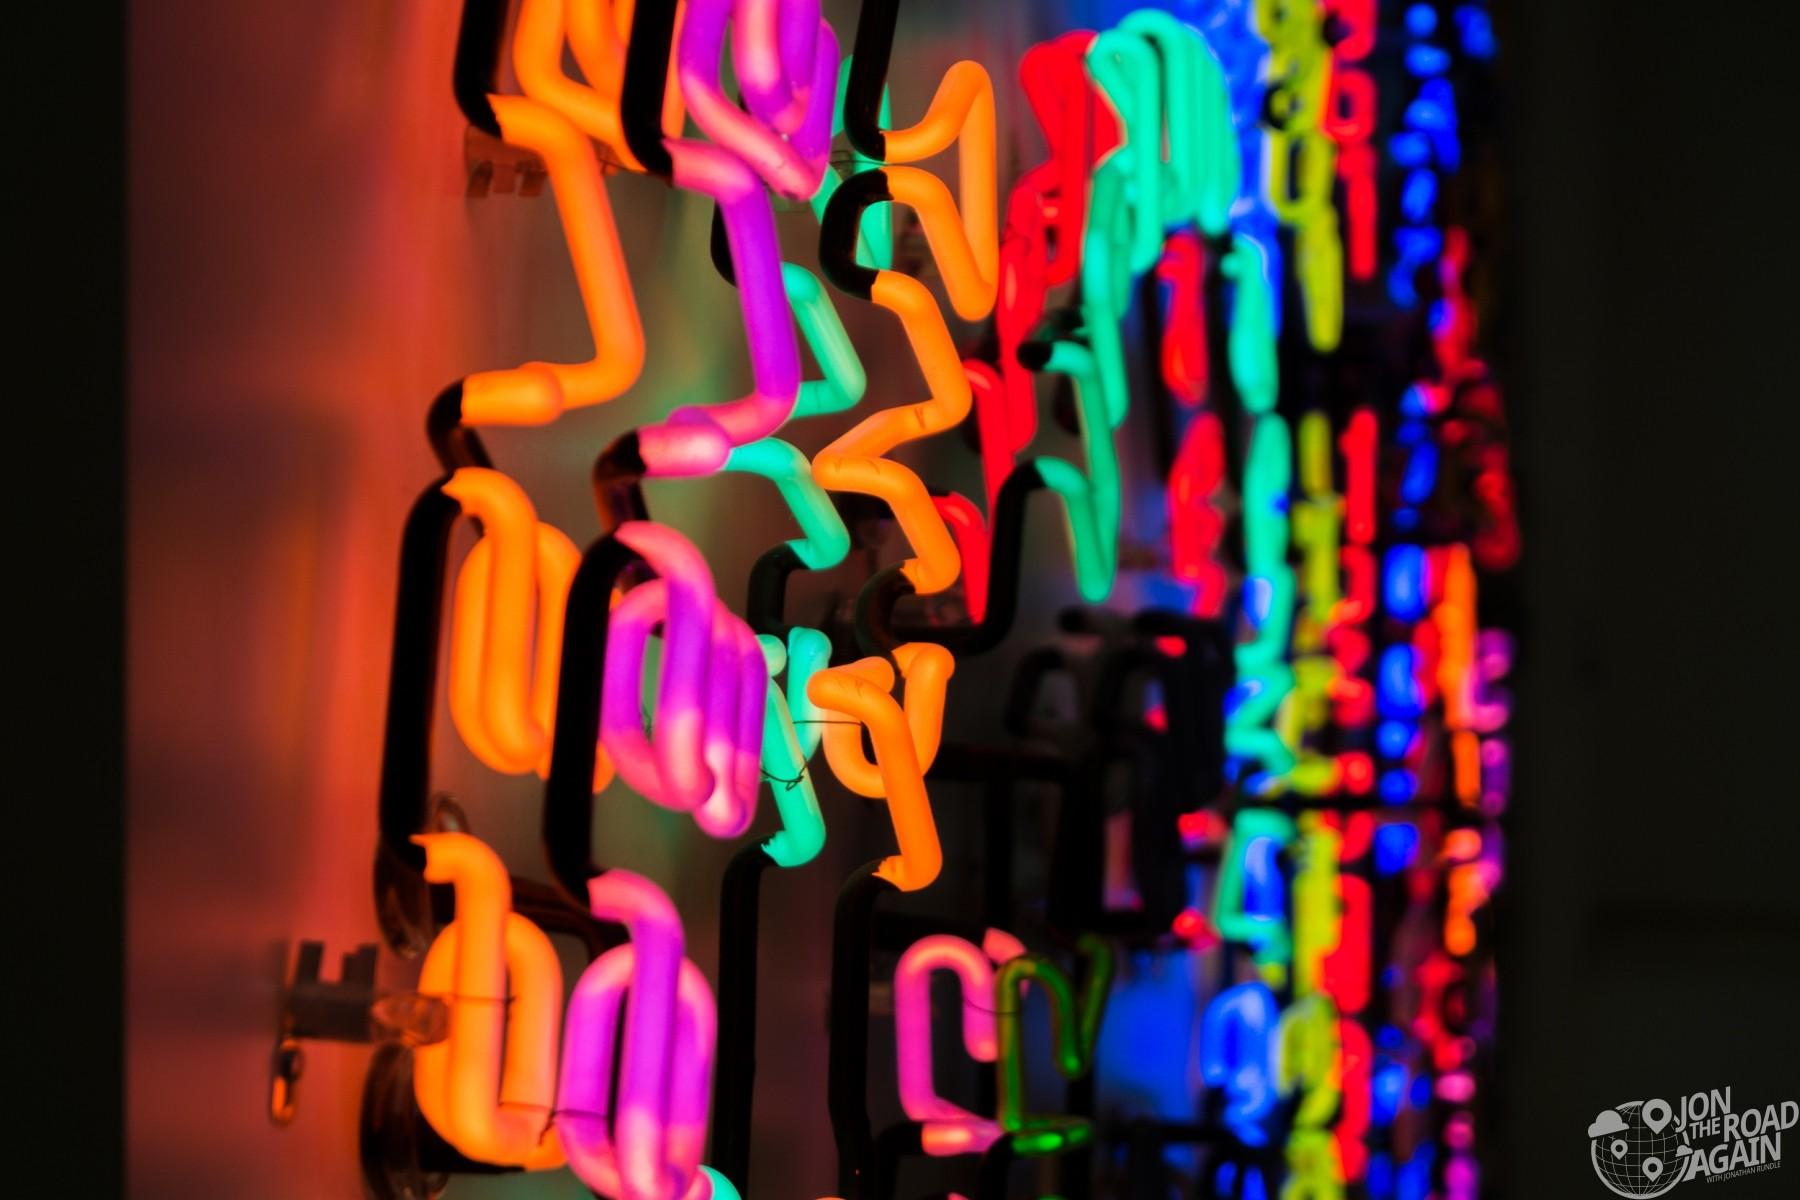 Having Fun/Good Life, Symptoms Bruce Nauman Carnegie Museum of Art